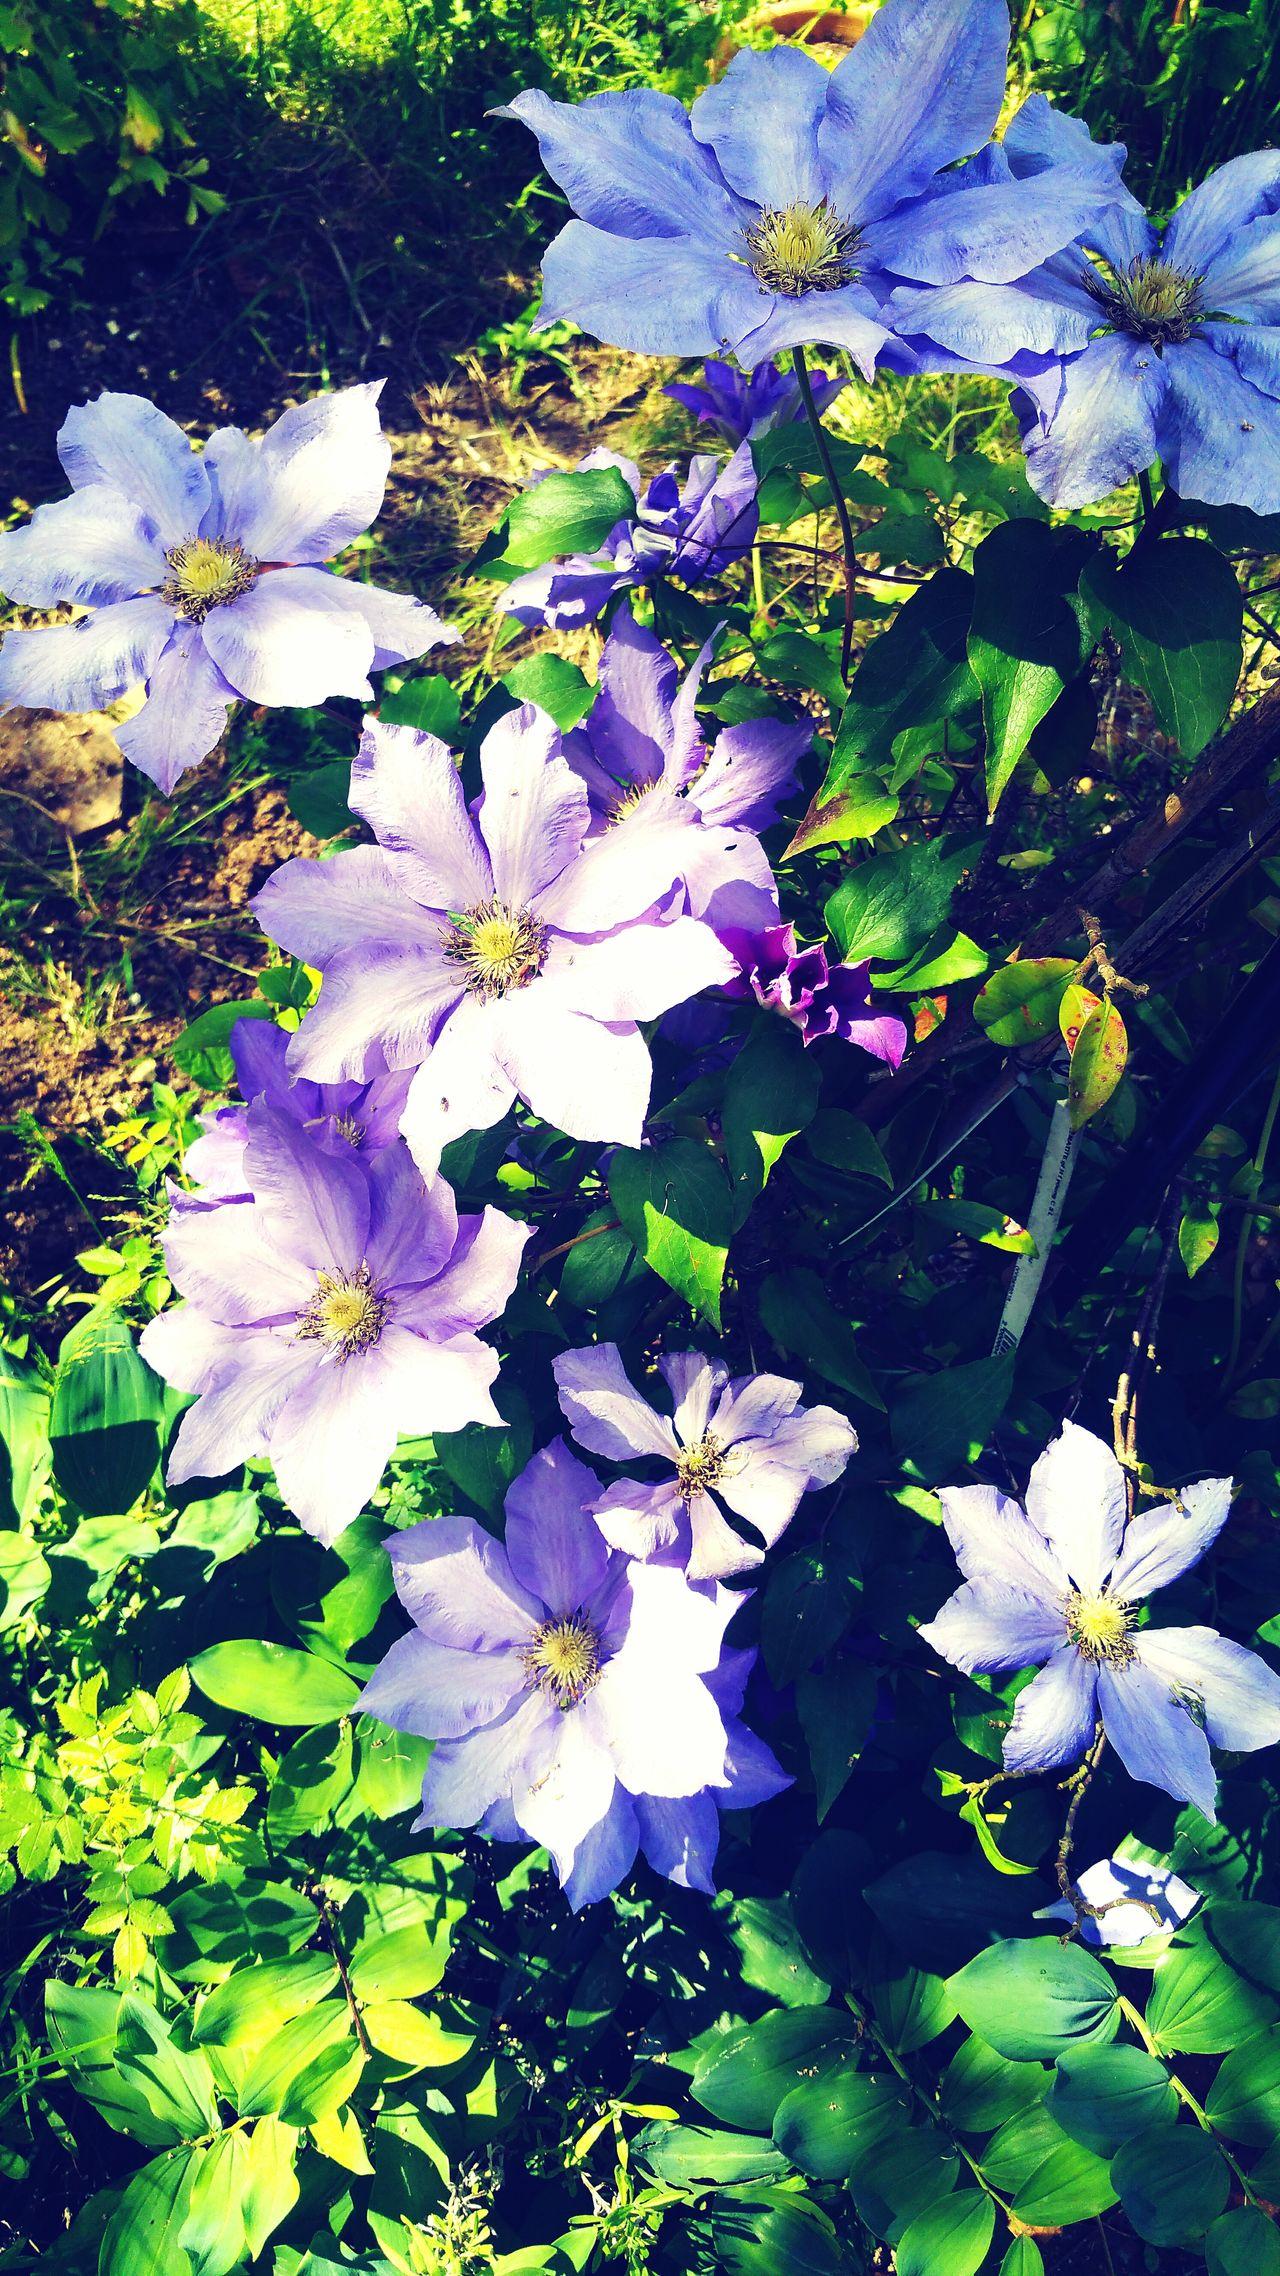 Flower Beauty In Nature Fragility Petal Blooming Flower Head Nature Freshness Clematis Clematis Flower